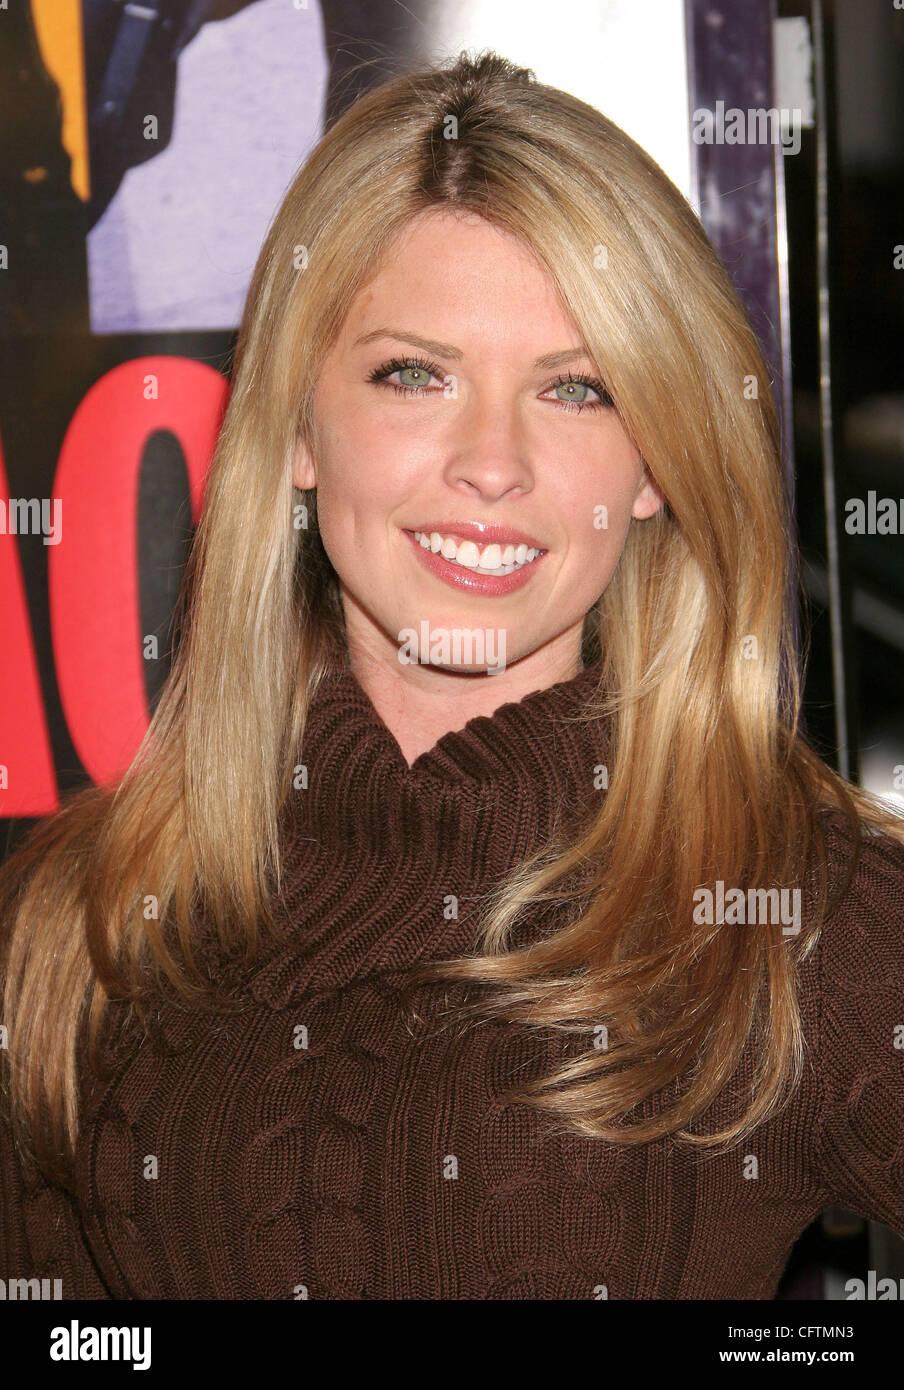 Jan 18, 2007; Hollywood, California, USA;  Actress NICOLE ANDREWS    at the 'Smokin Aces' World Premeire - Stock Image